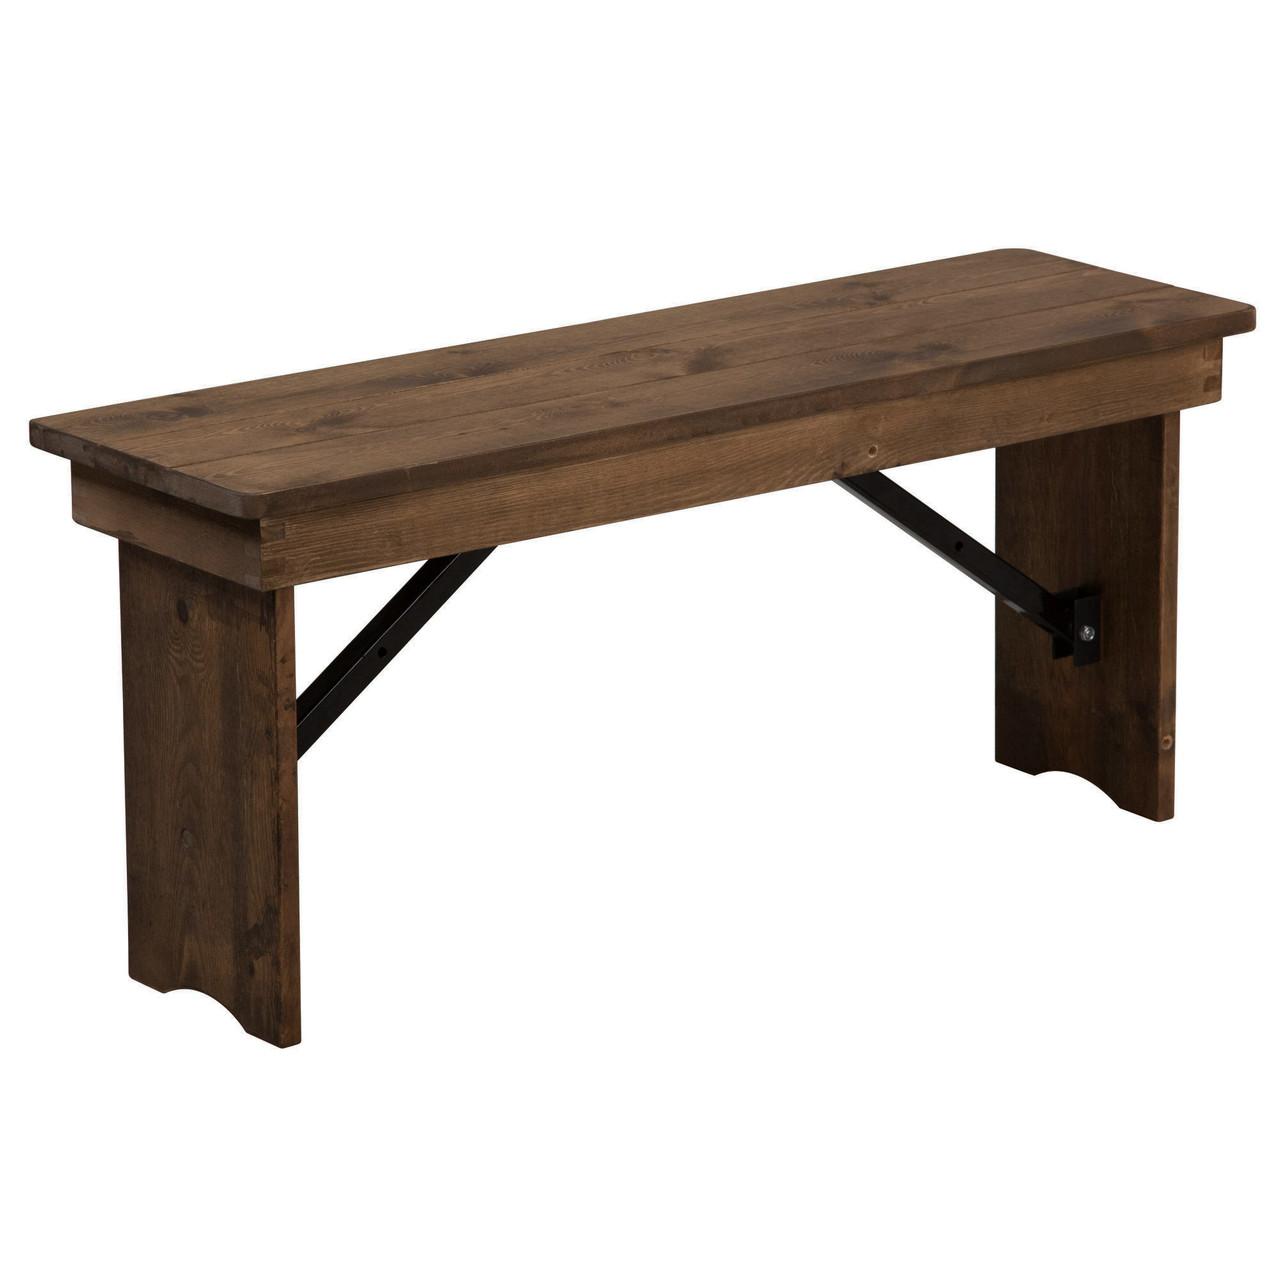 12x40 Farmhouse Table Bench Barn Wood Brown